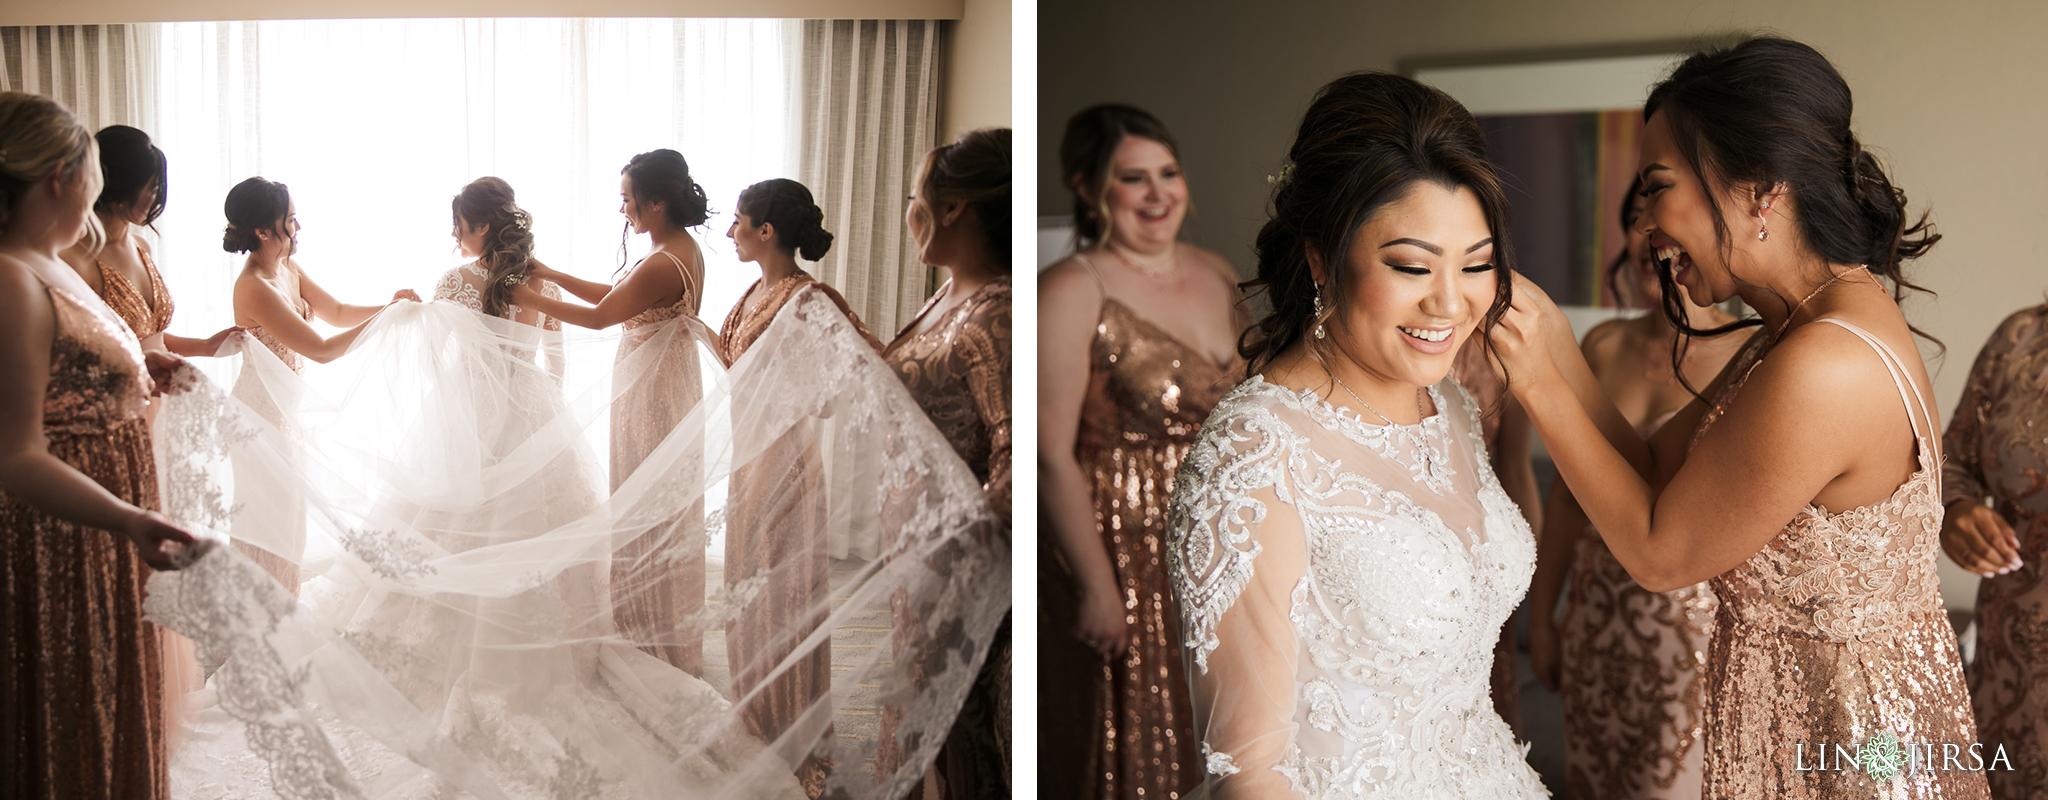 03 The Newport Beach Marriott Hotel Wedding Photography